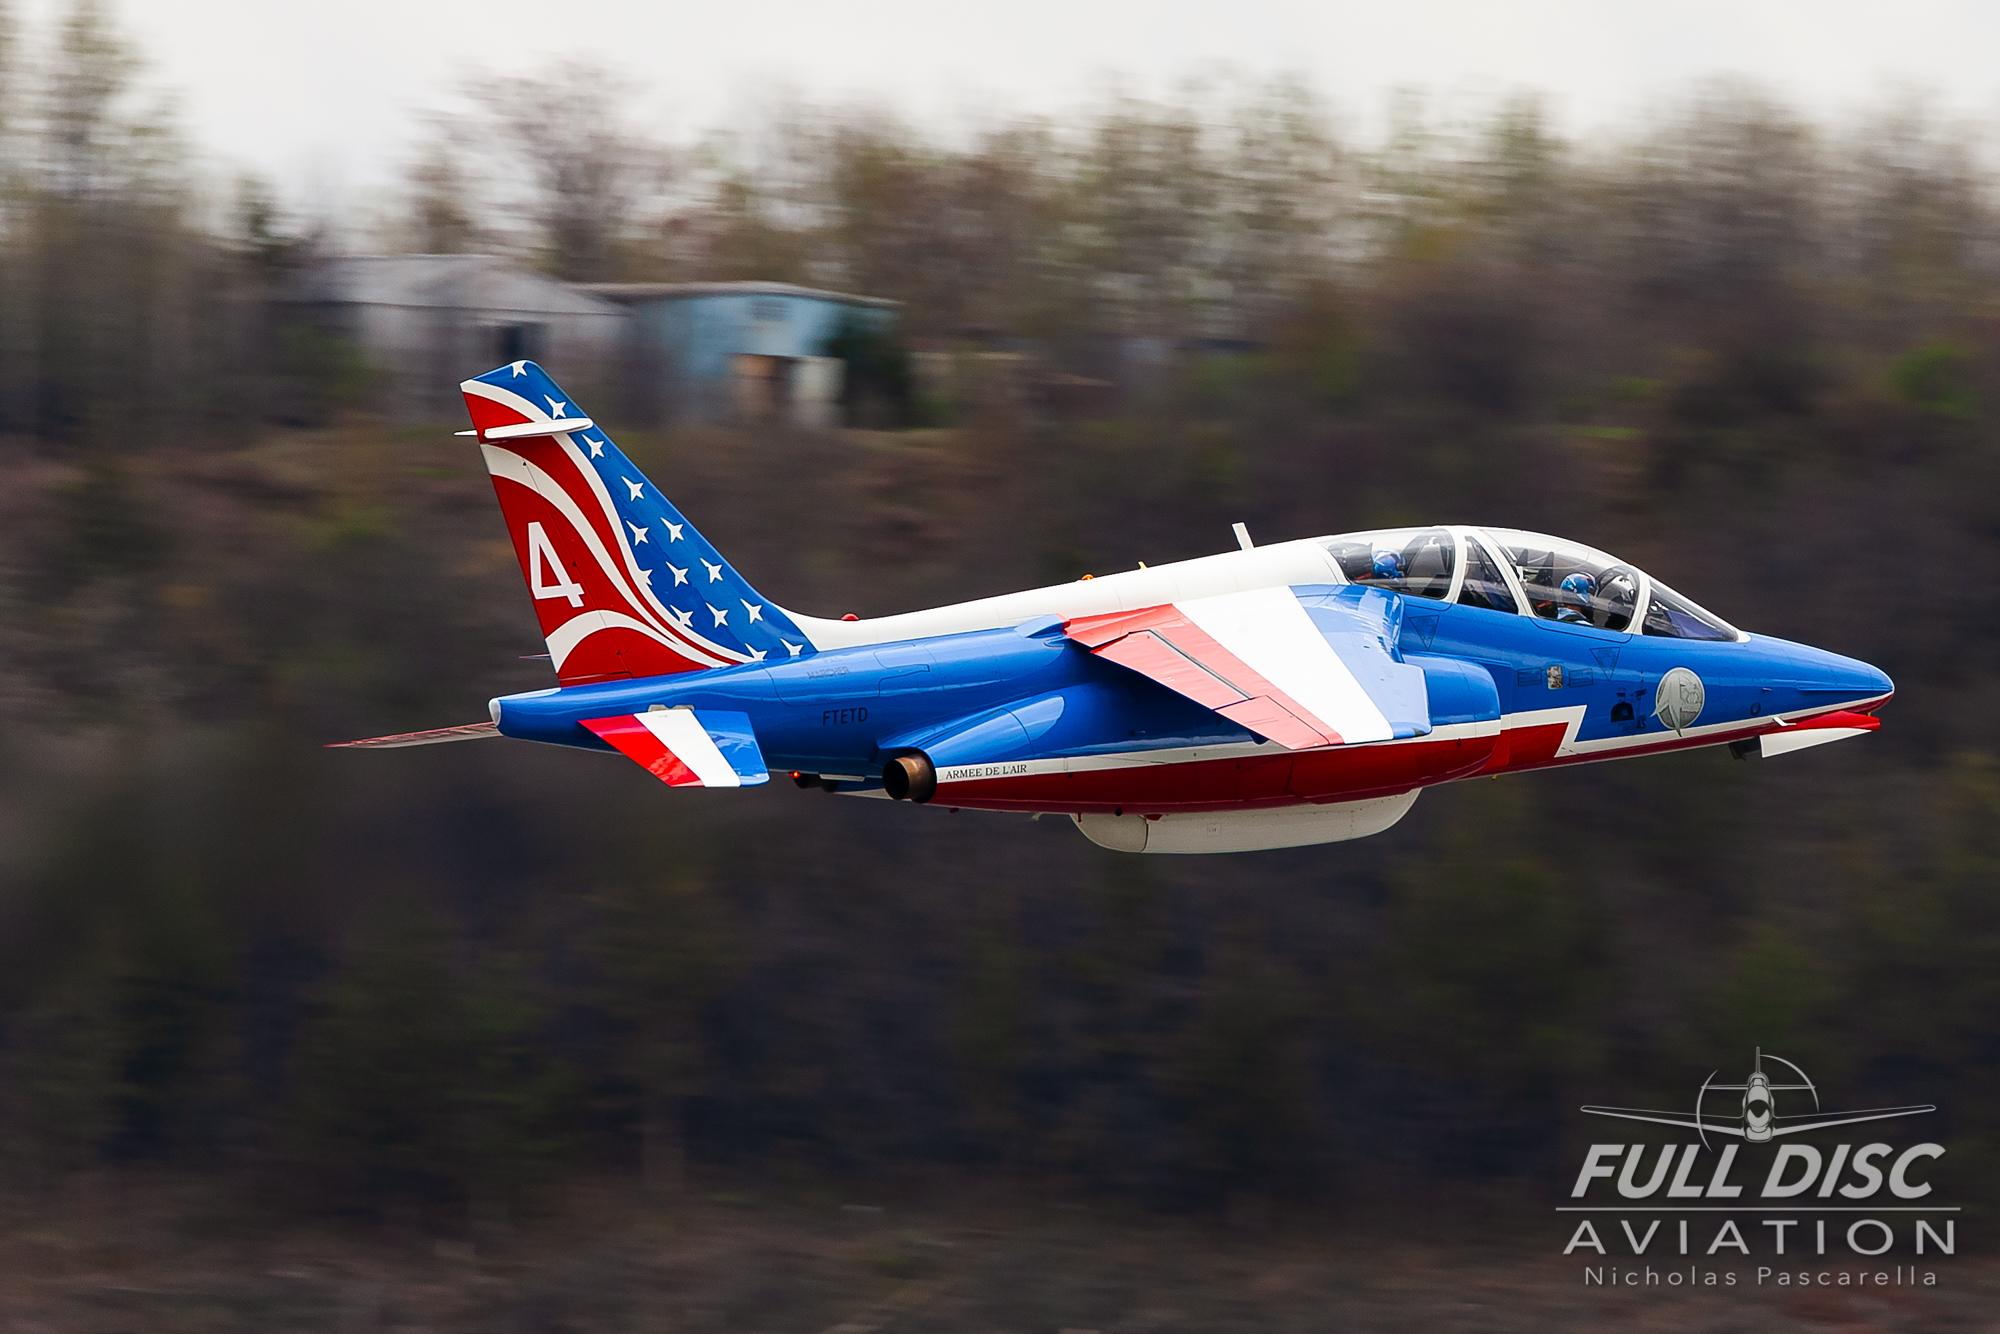 nickpascarella_nicholaspascarella_fulldiscaviation_aircraft_patrouilledefrance_takeoff.jpg